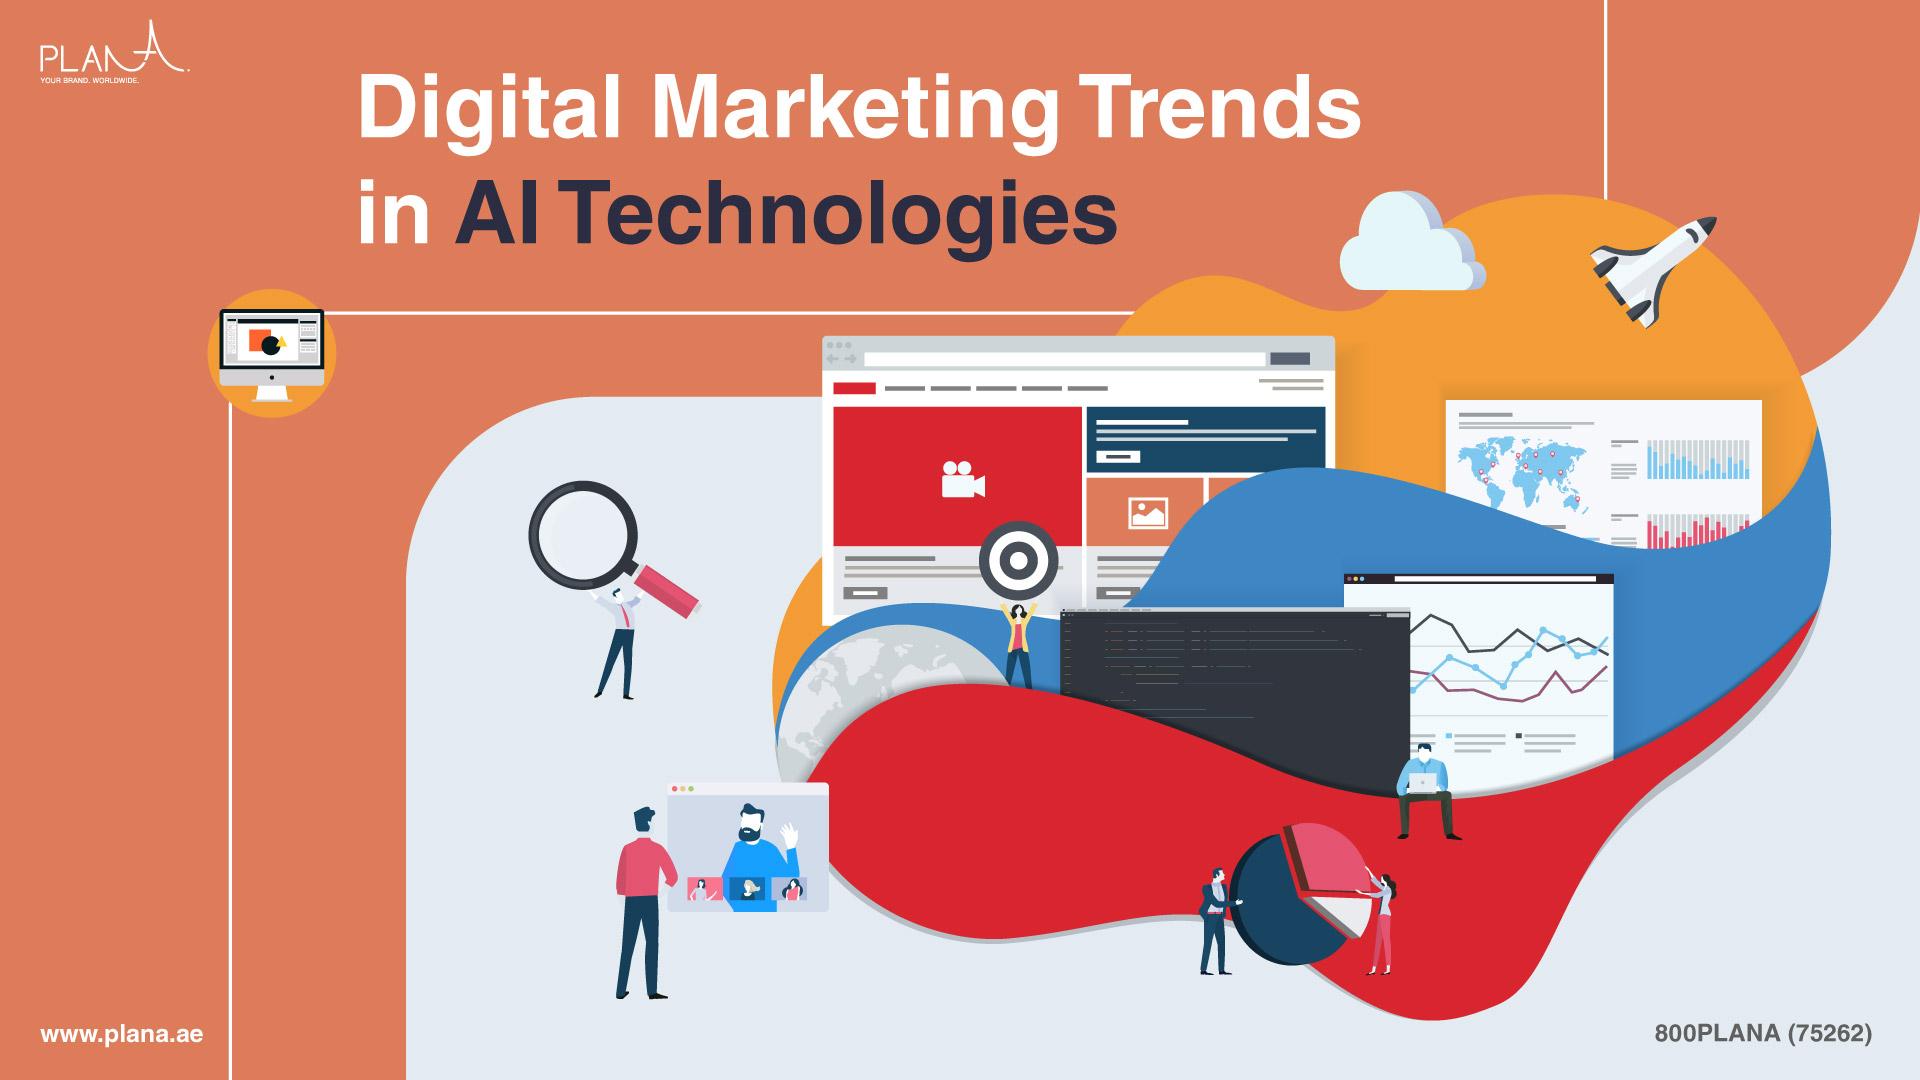 Digital Marketing Trends in AI Technologies